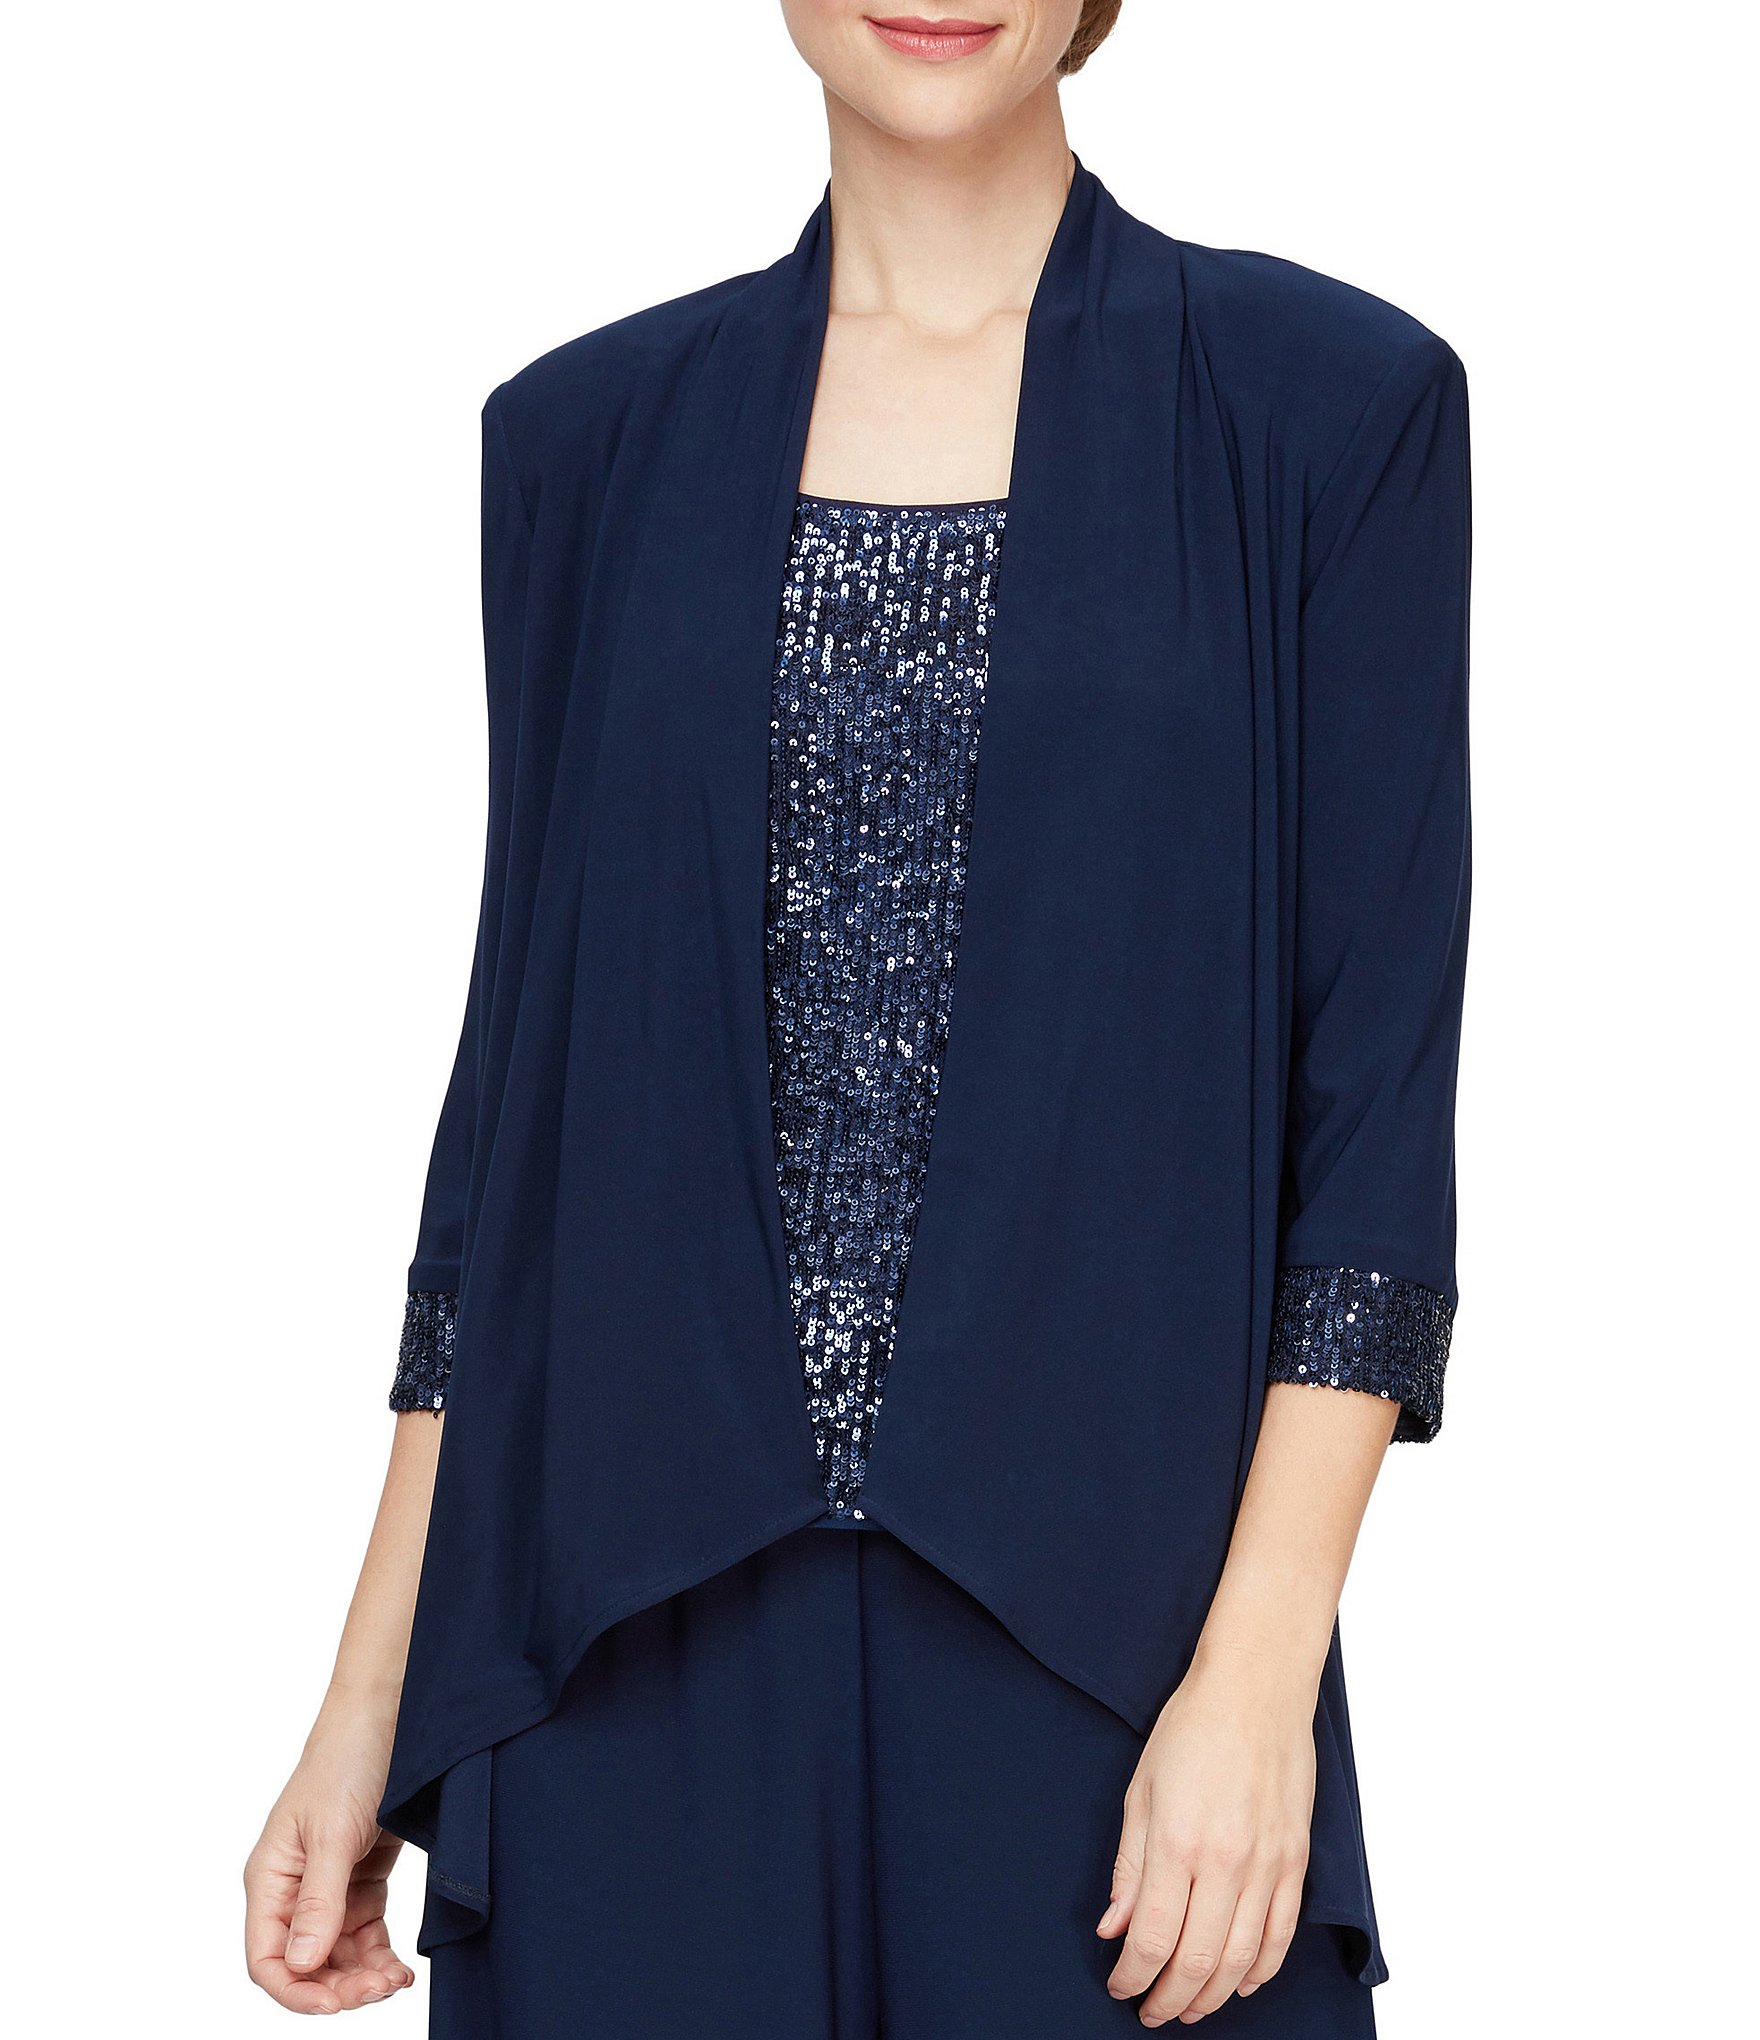 Alex Evenings Womens Black Satin Trim Open Front Crop Blazer Jacket 16 BHFO 4575